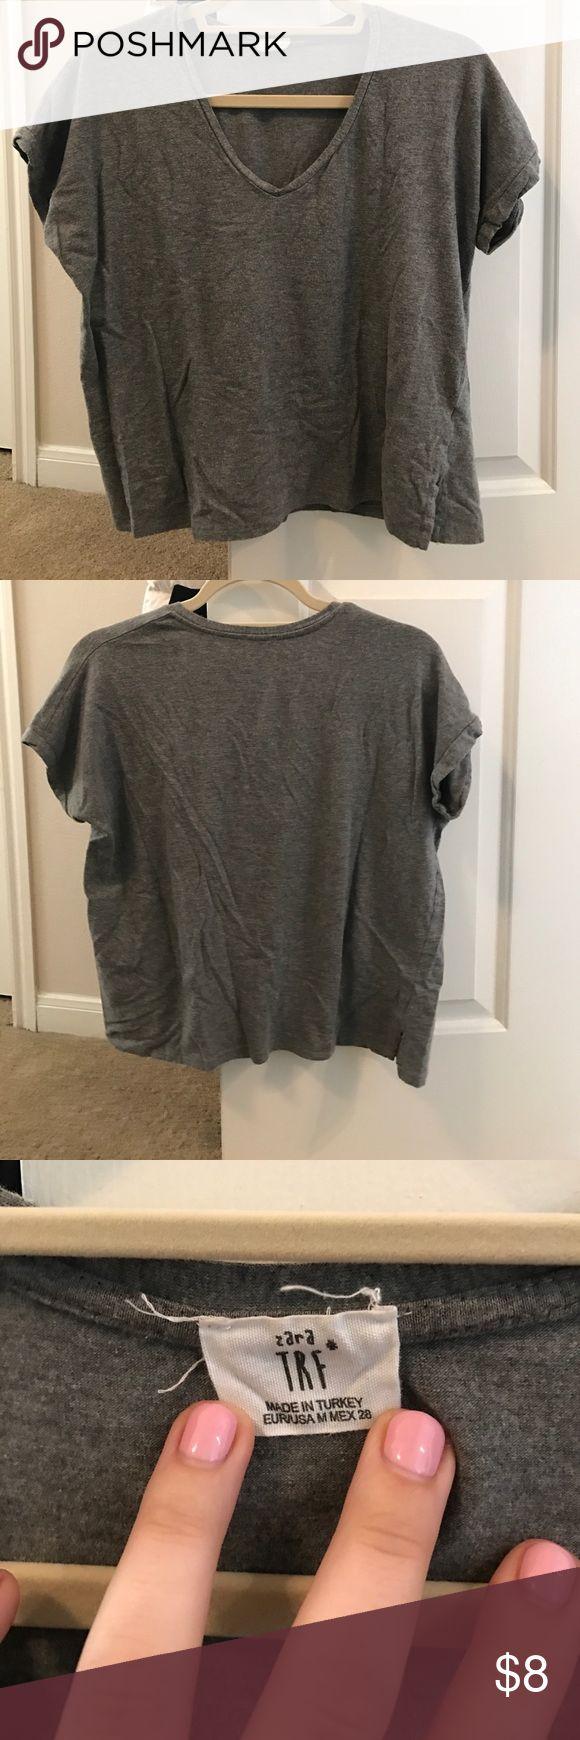 Zara tshirt Cute Zara tshirt. Worn a few times. Size medium but can also fit a small Zara Tops Tees - Short Sleeve